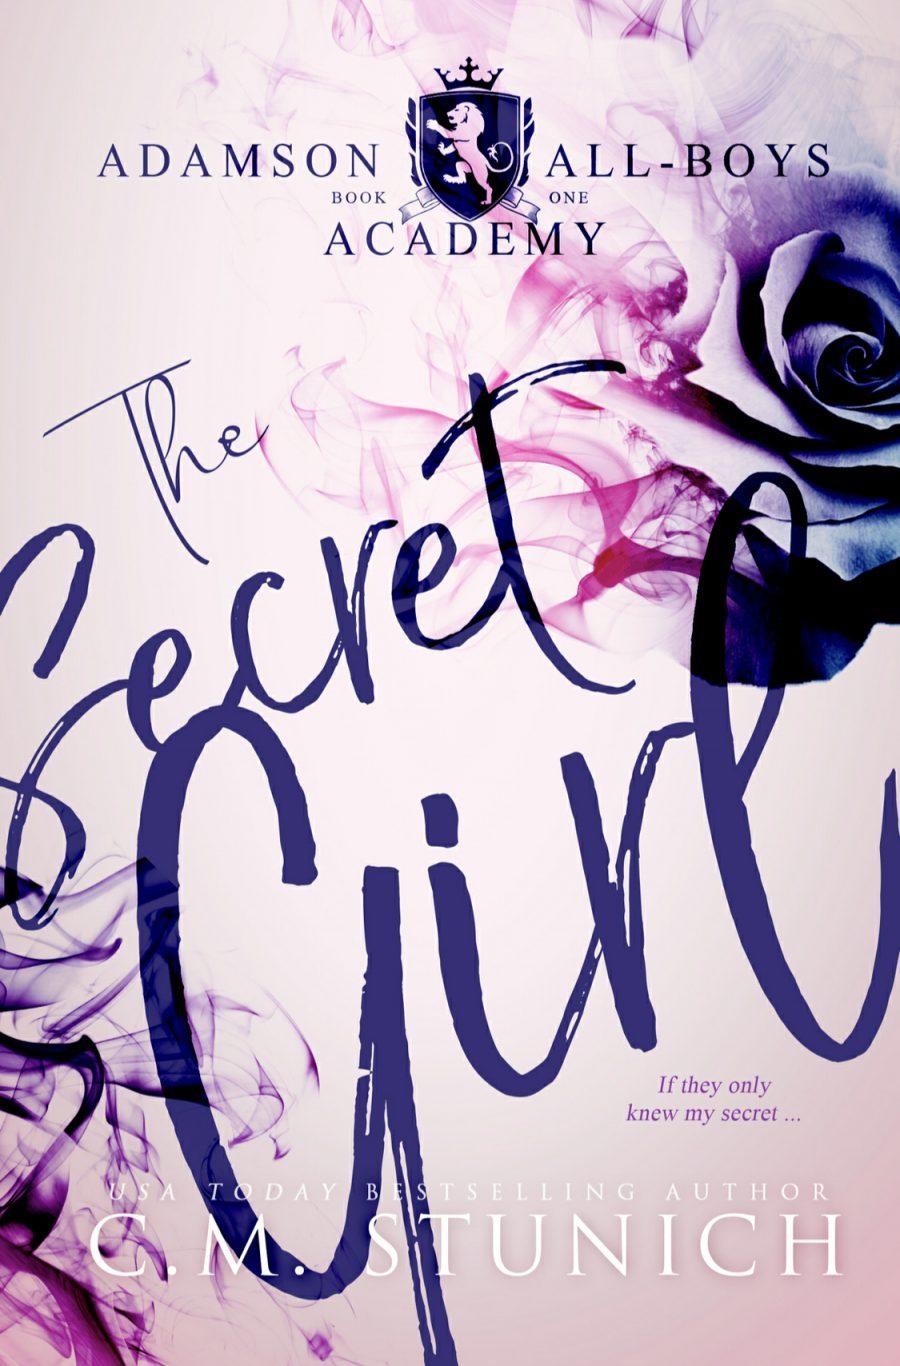 The Secret Girl: A High School Bully Romance by C.M. Stunich - A Book Review #BookReview #YA/NA #BullyRomance #MildBully #RH #ReverseHarem #WhyChoose #5Star #KU